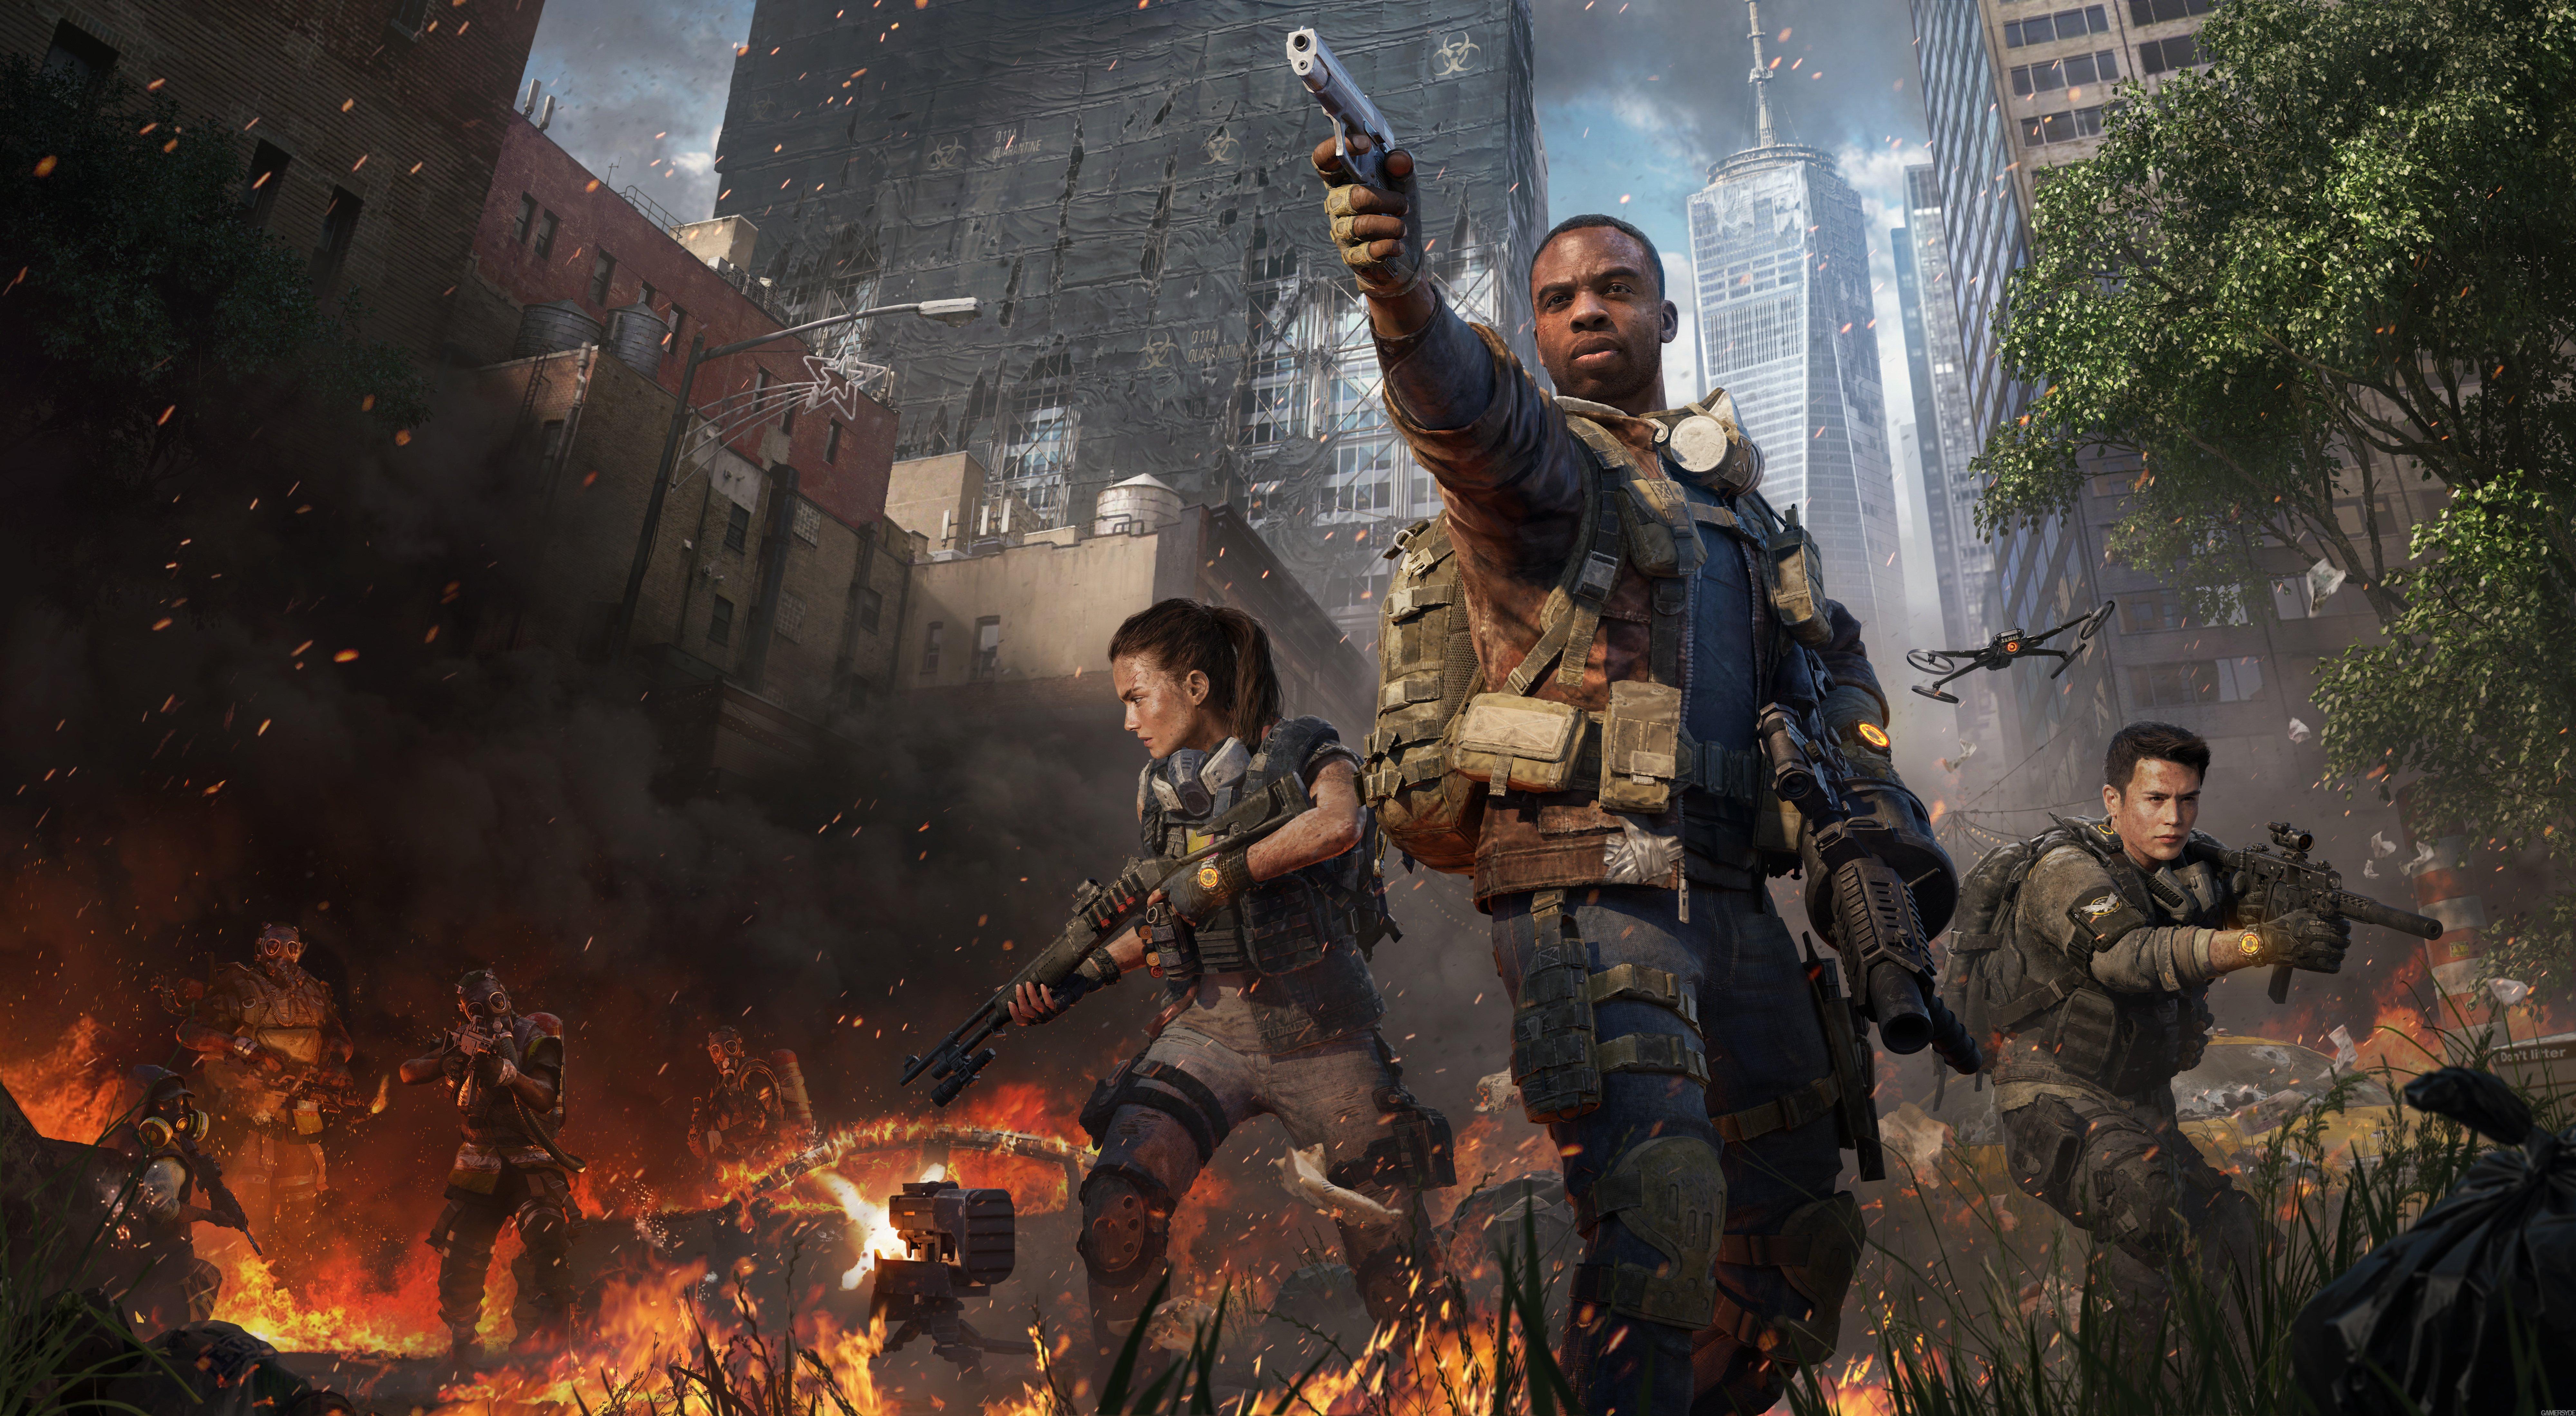 Fondos de pantalla Tom Clancy's The Division 2 Warlords of New York